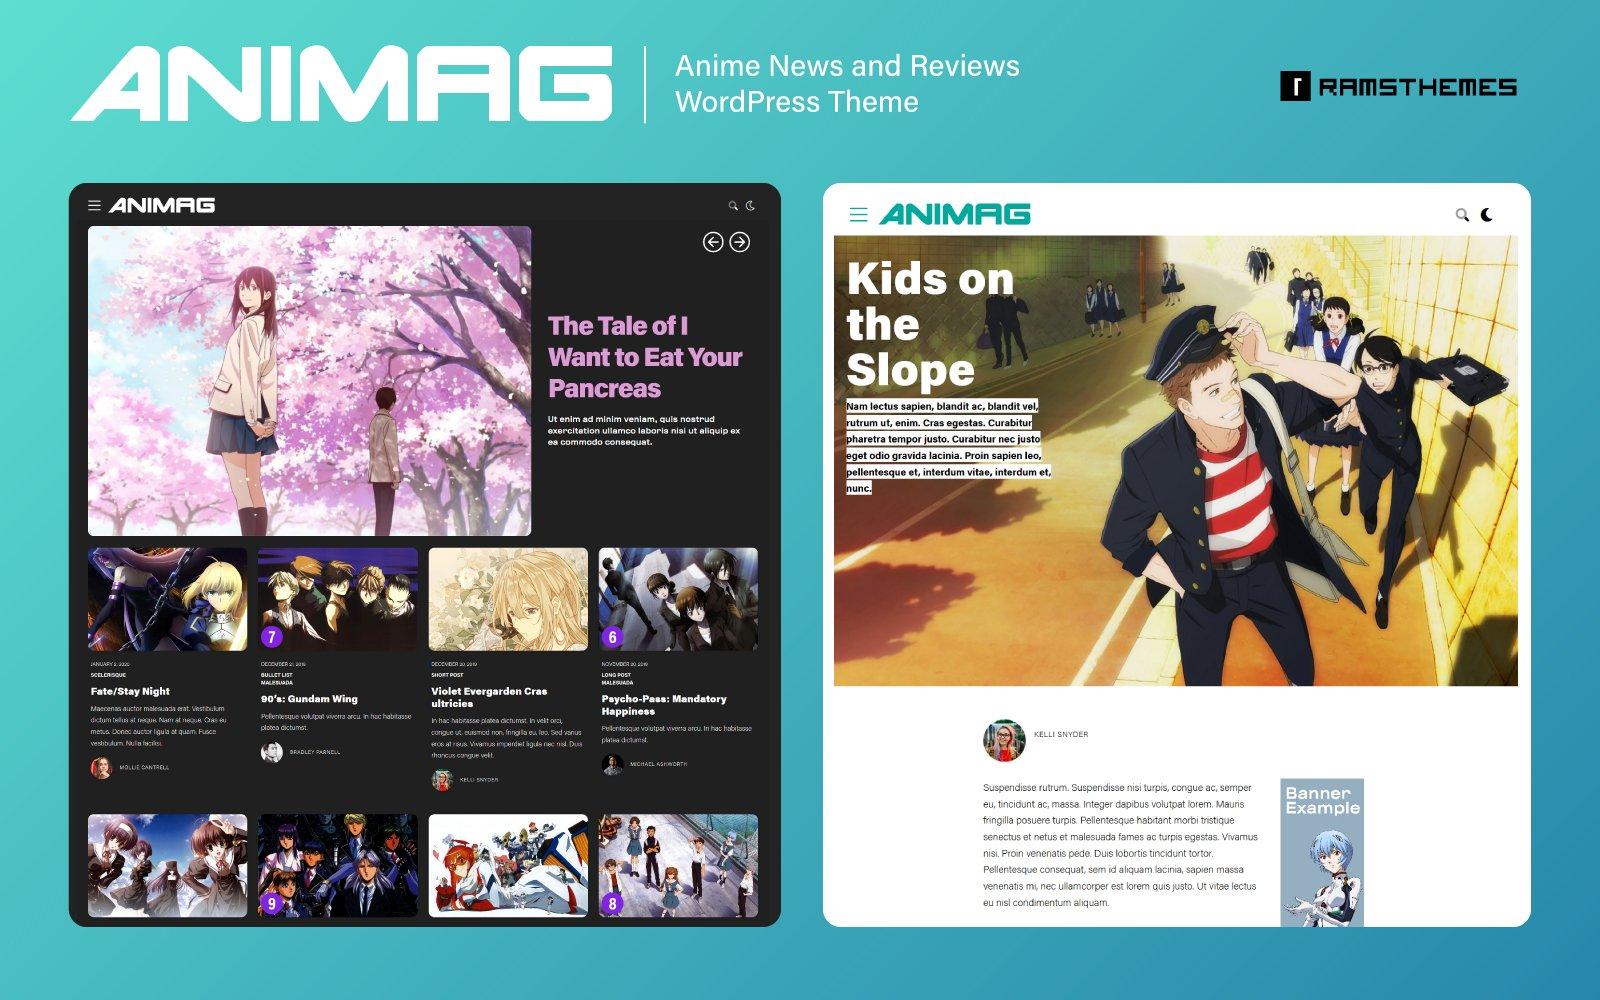 ANIMAG - Anime and Manga Magazine WordPress Theme